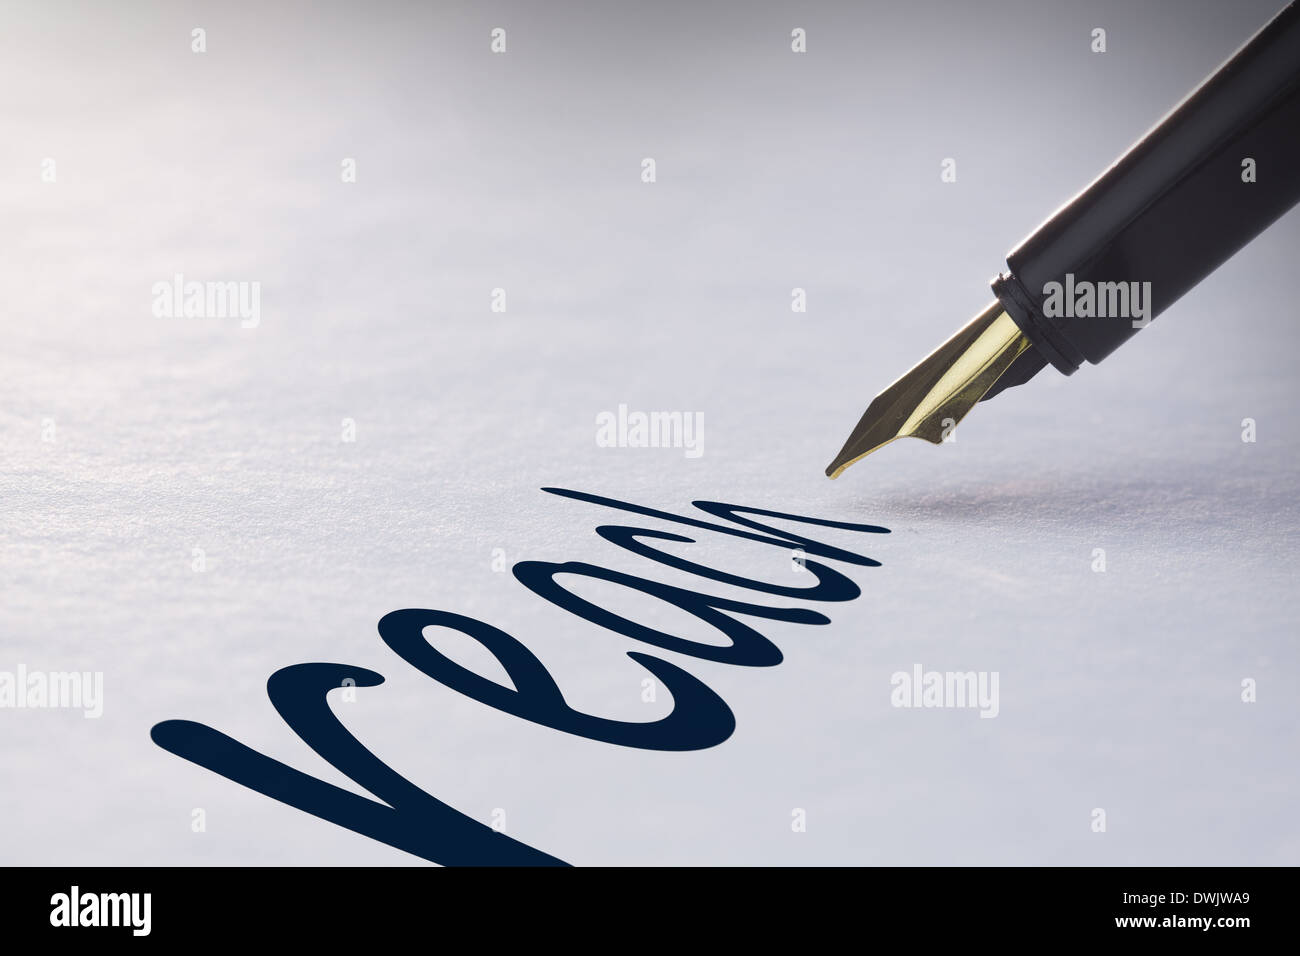 Fountain pen writing Reach - Stock Image